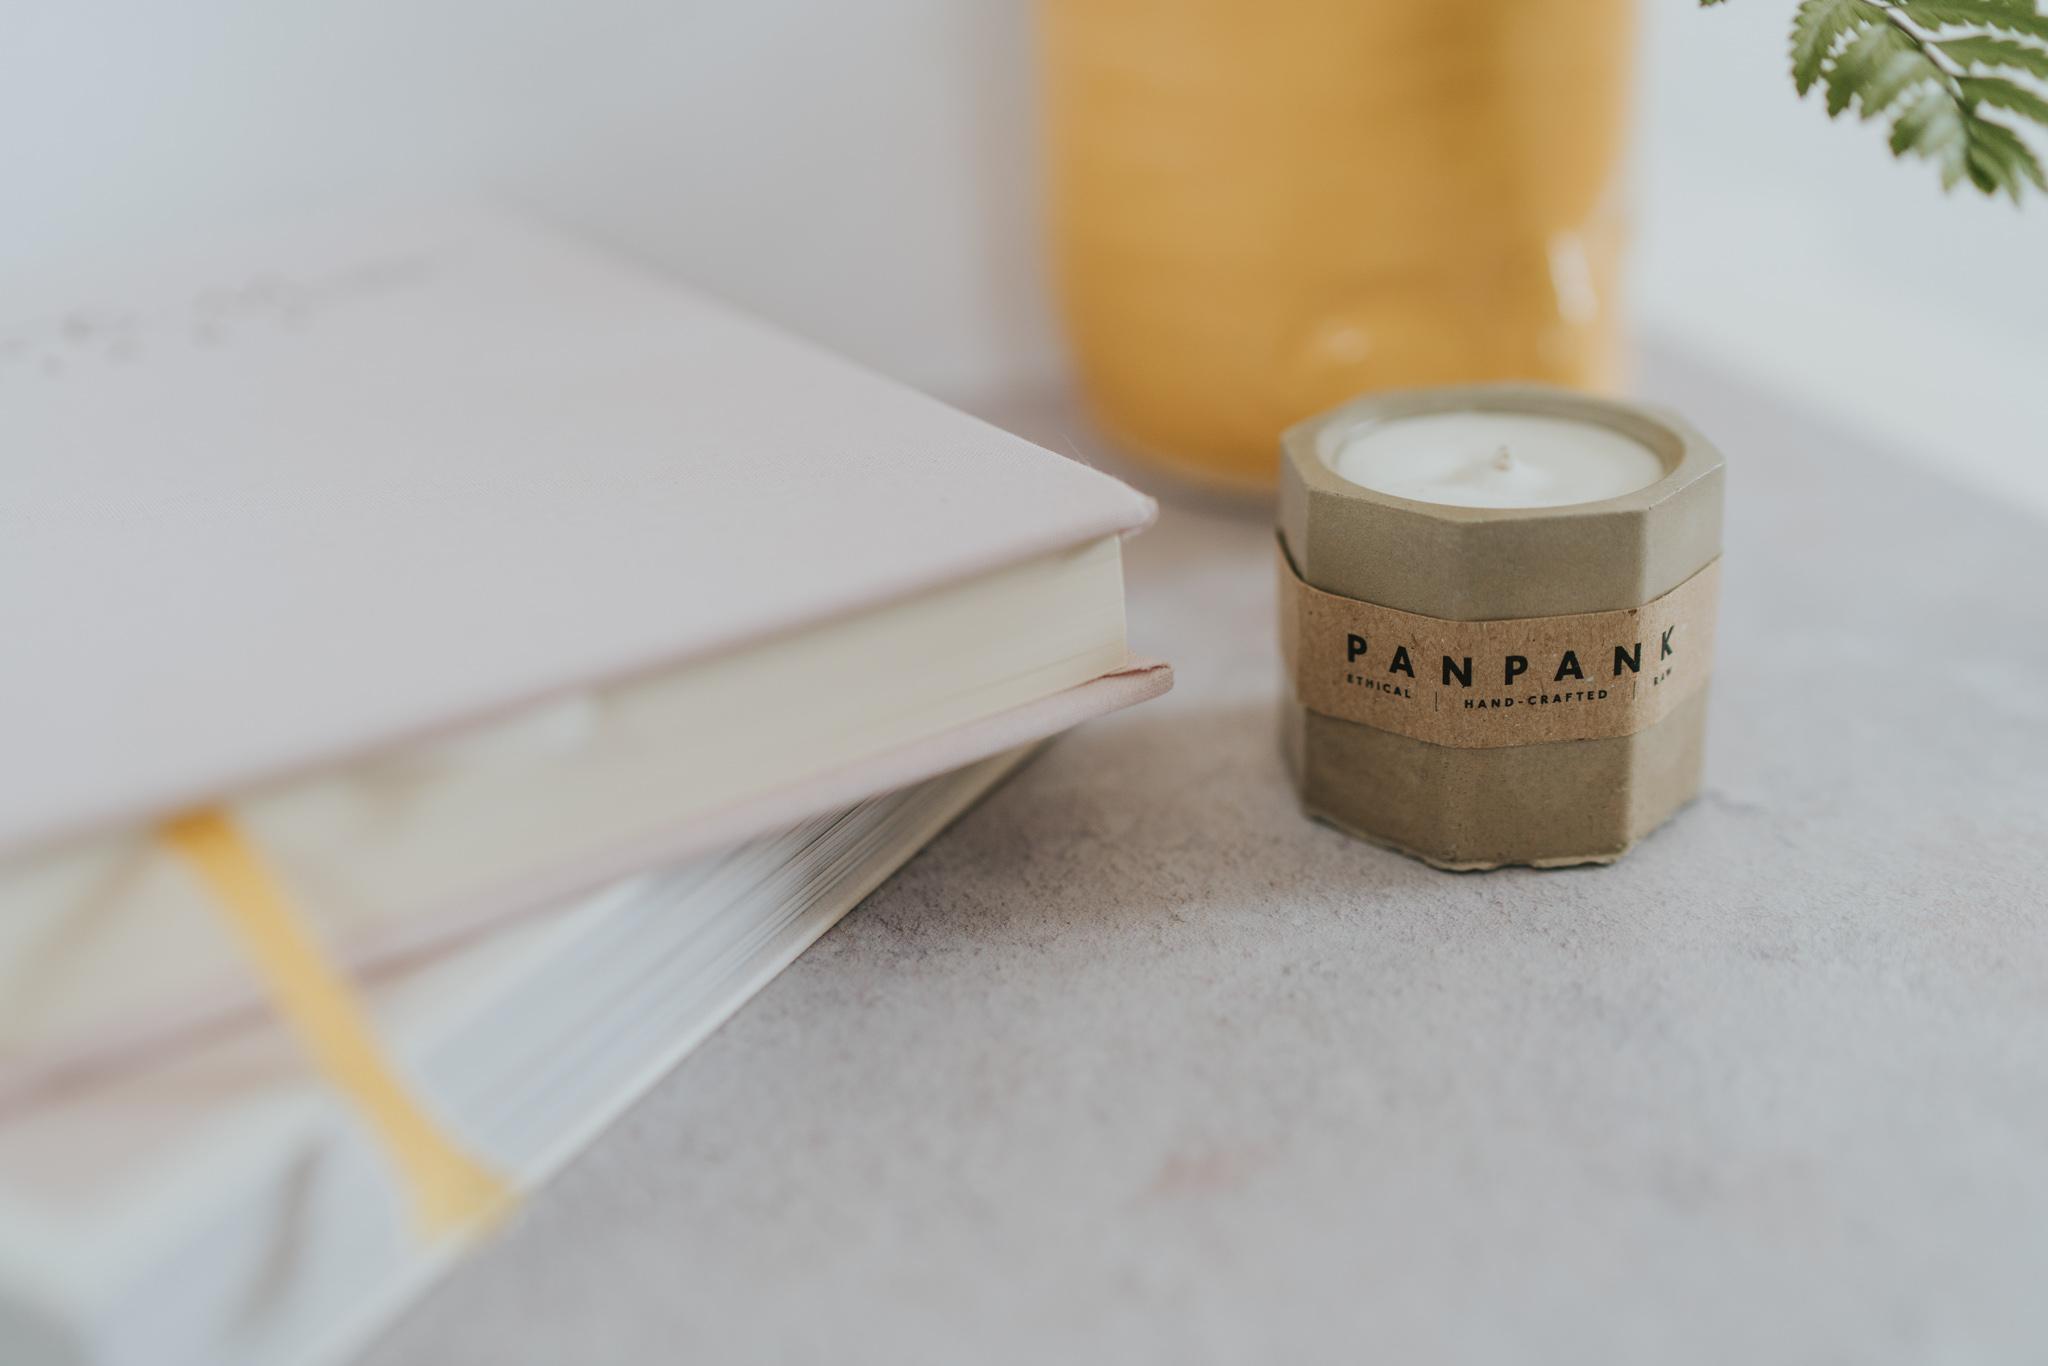 business-branding-panpank-candles-grace-elizabeth-colchester-essex-devon-suffolk-and-norfolk-alternative-wedding-and-family-photographer (7 of 19).jpg